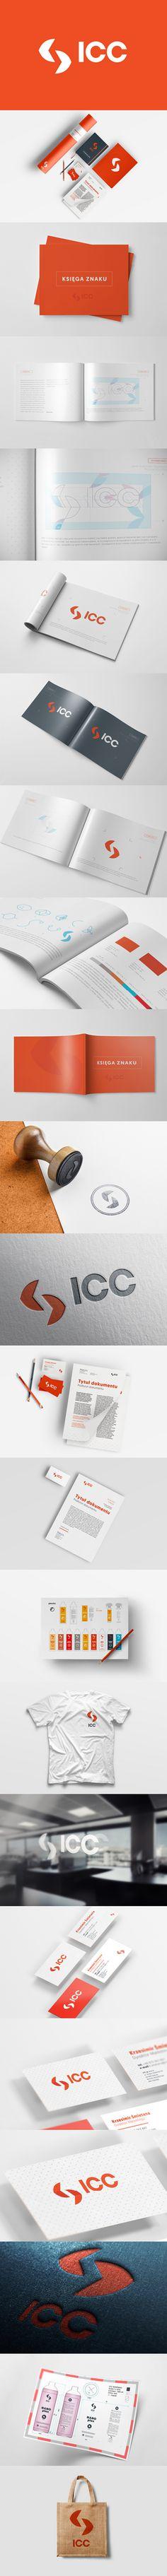 ICC Branding. See full creation!